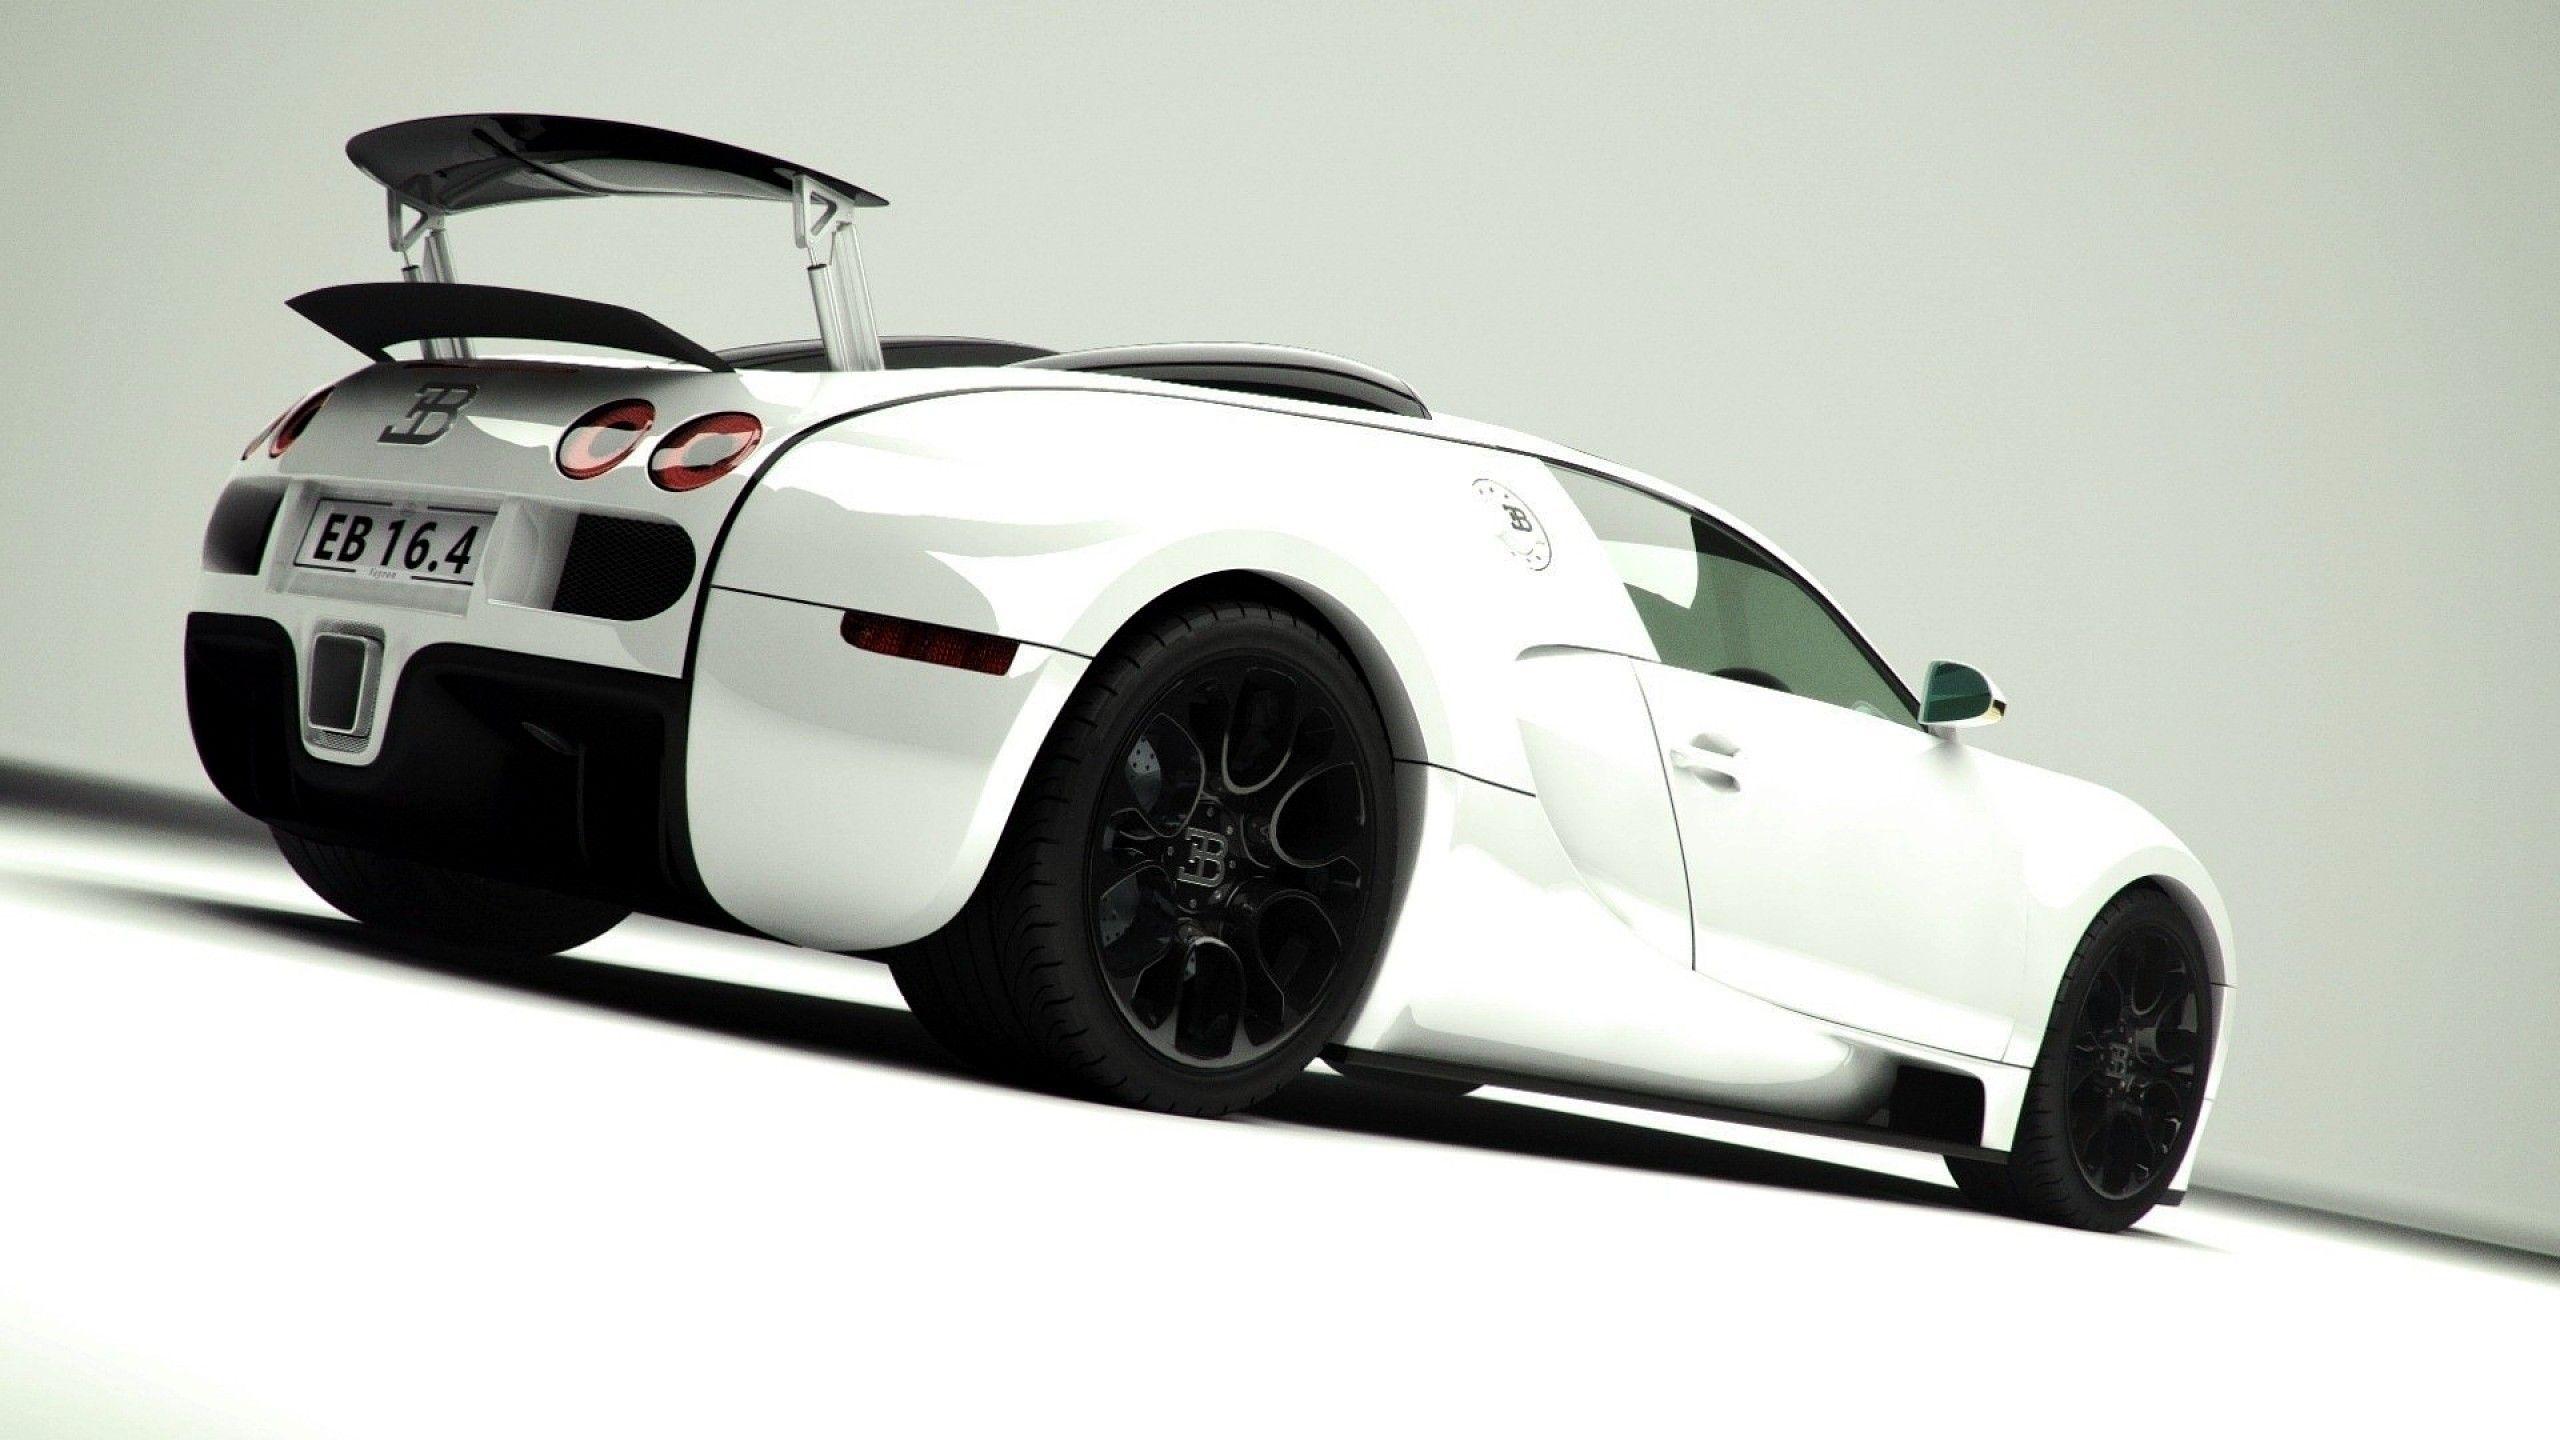 Bugatti Veyron Pictures Visit Here For Car Rental Info Http Www Bravorentacardubai Com Brand Porsche Bugatti Cars Bugatti Veyron Bugatti Veyron Bugatti